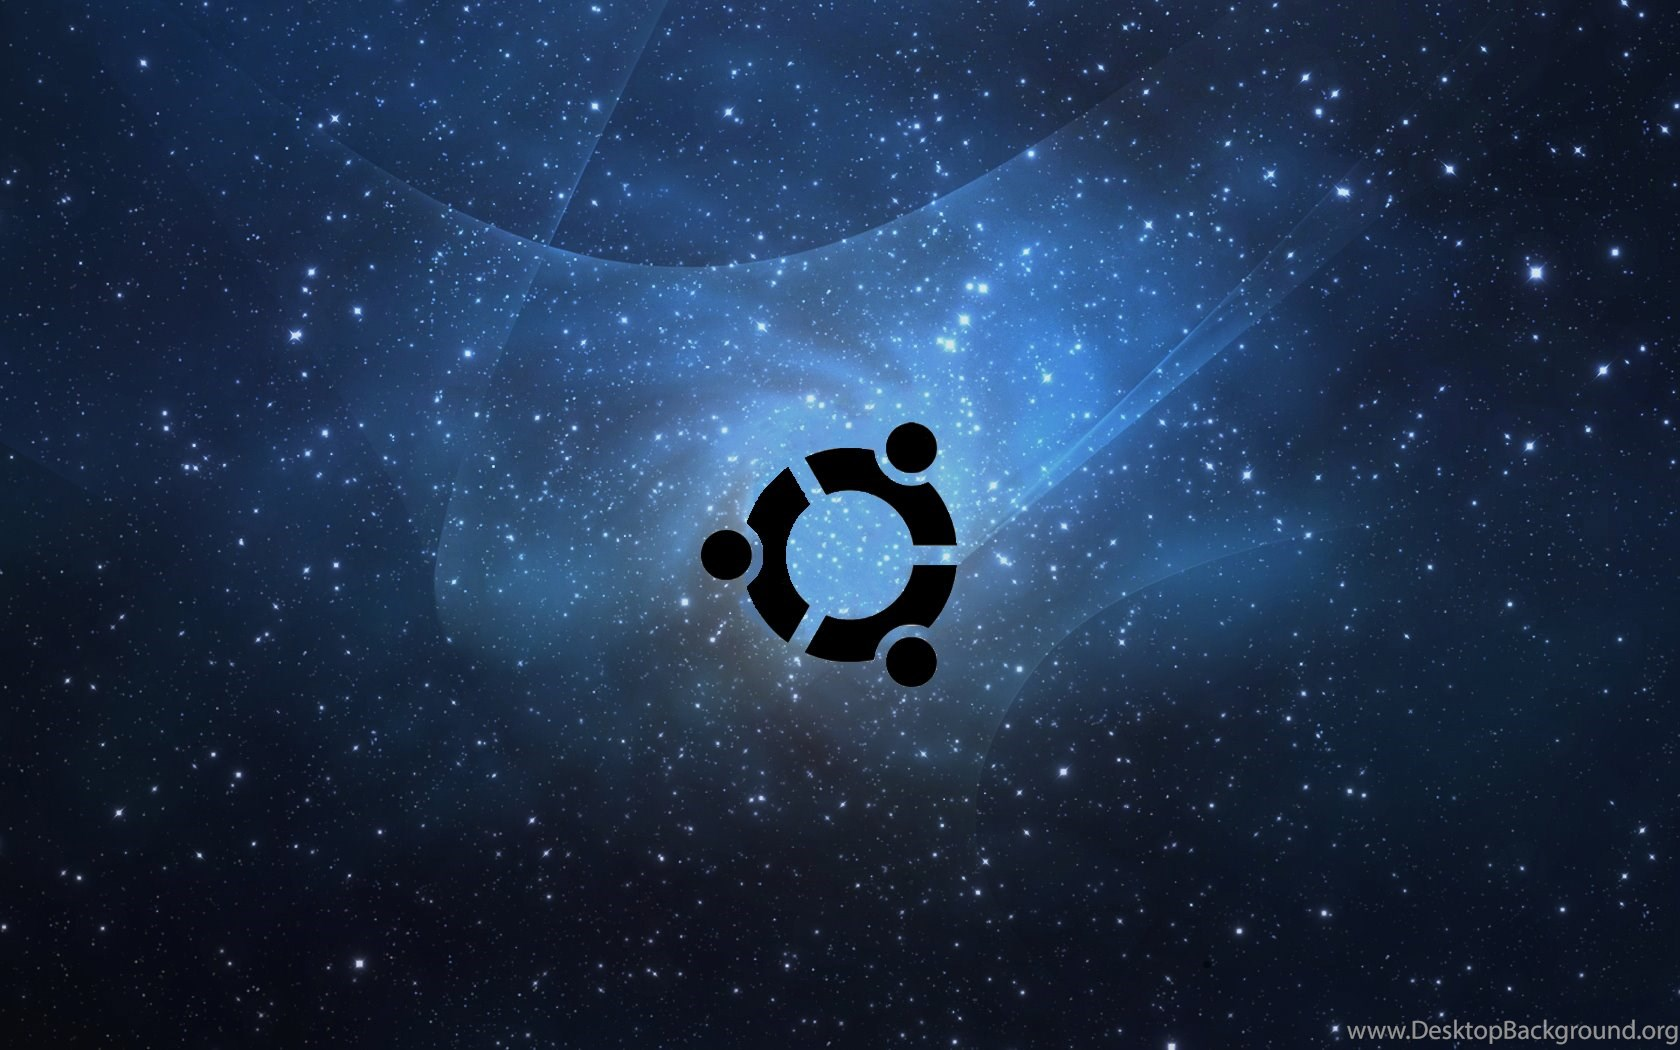 Ubuntu Space Wallpapers Desktop Background